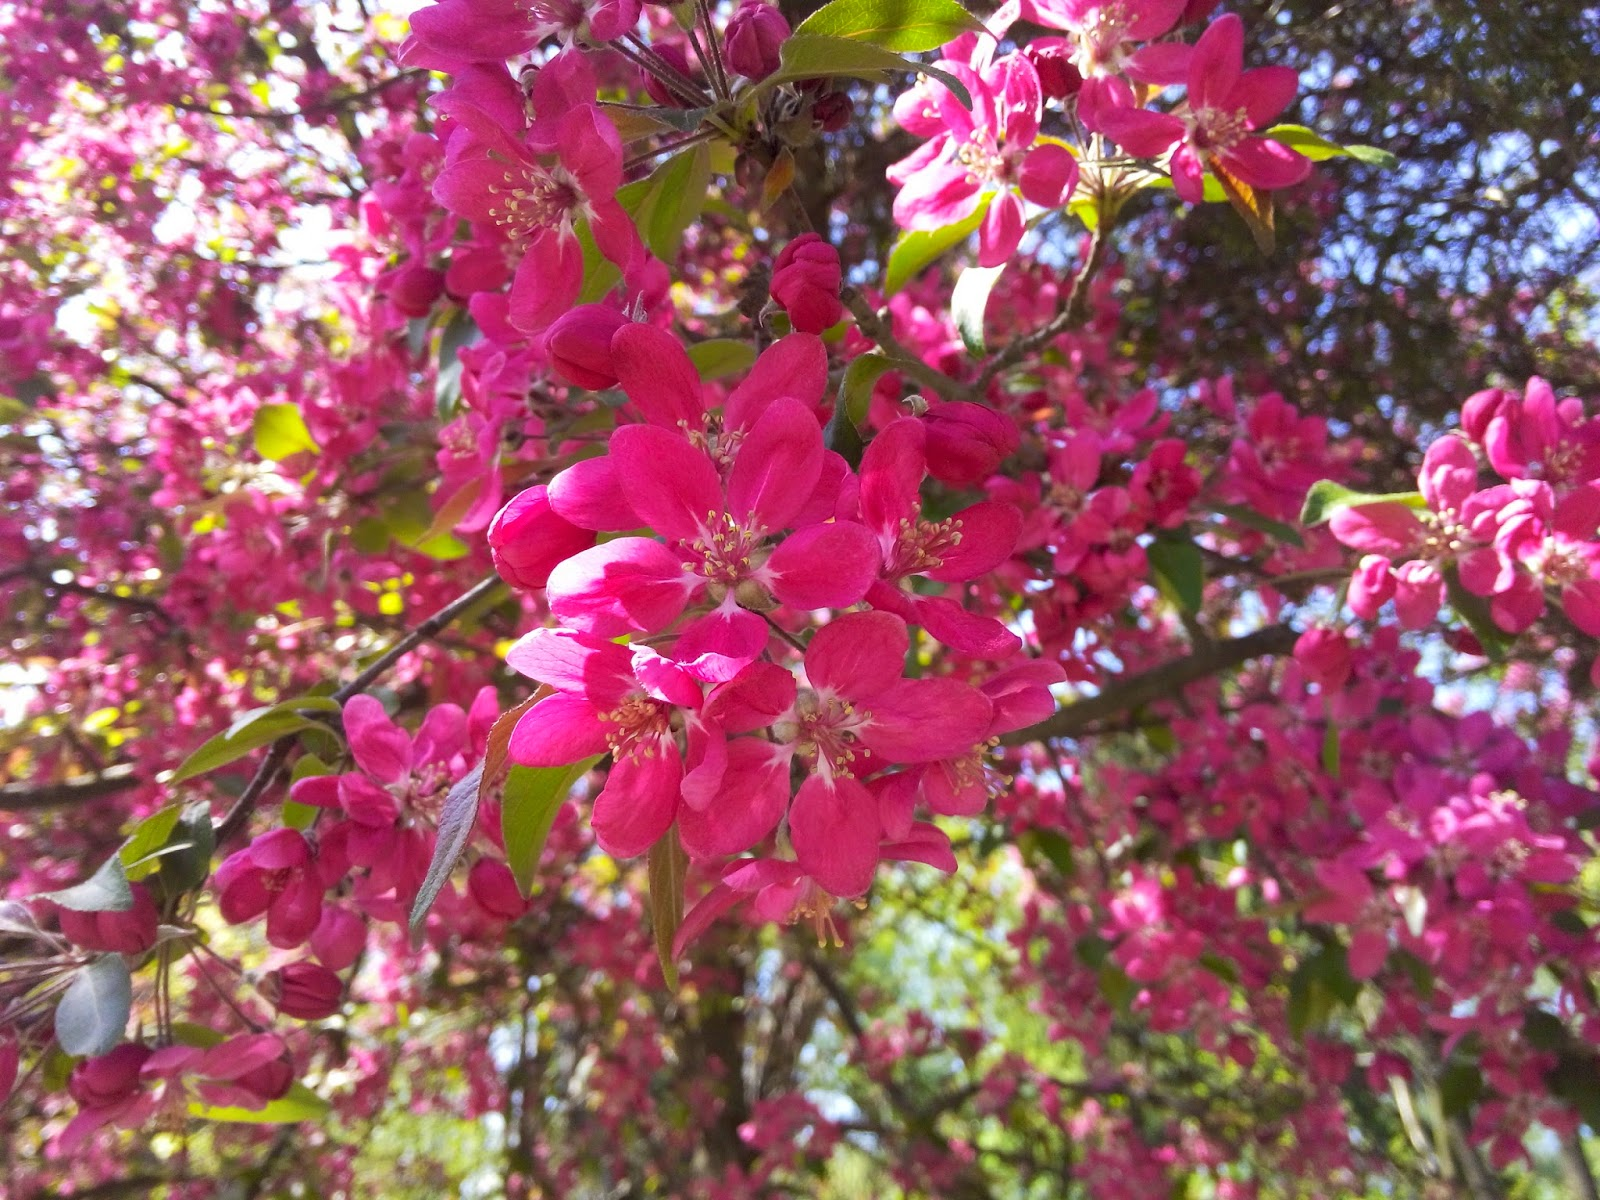 iubesc natura arbusti ornamentali flori roz